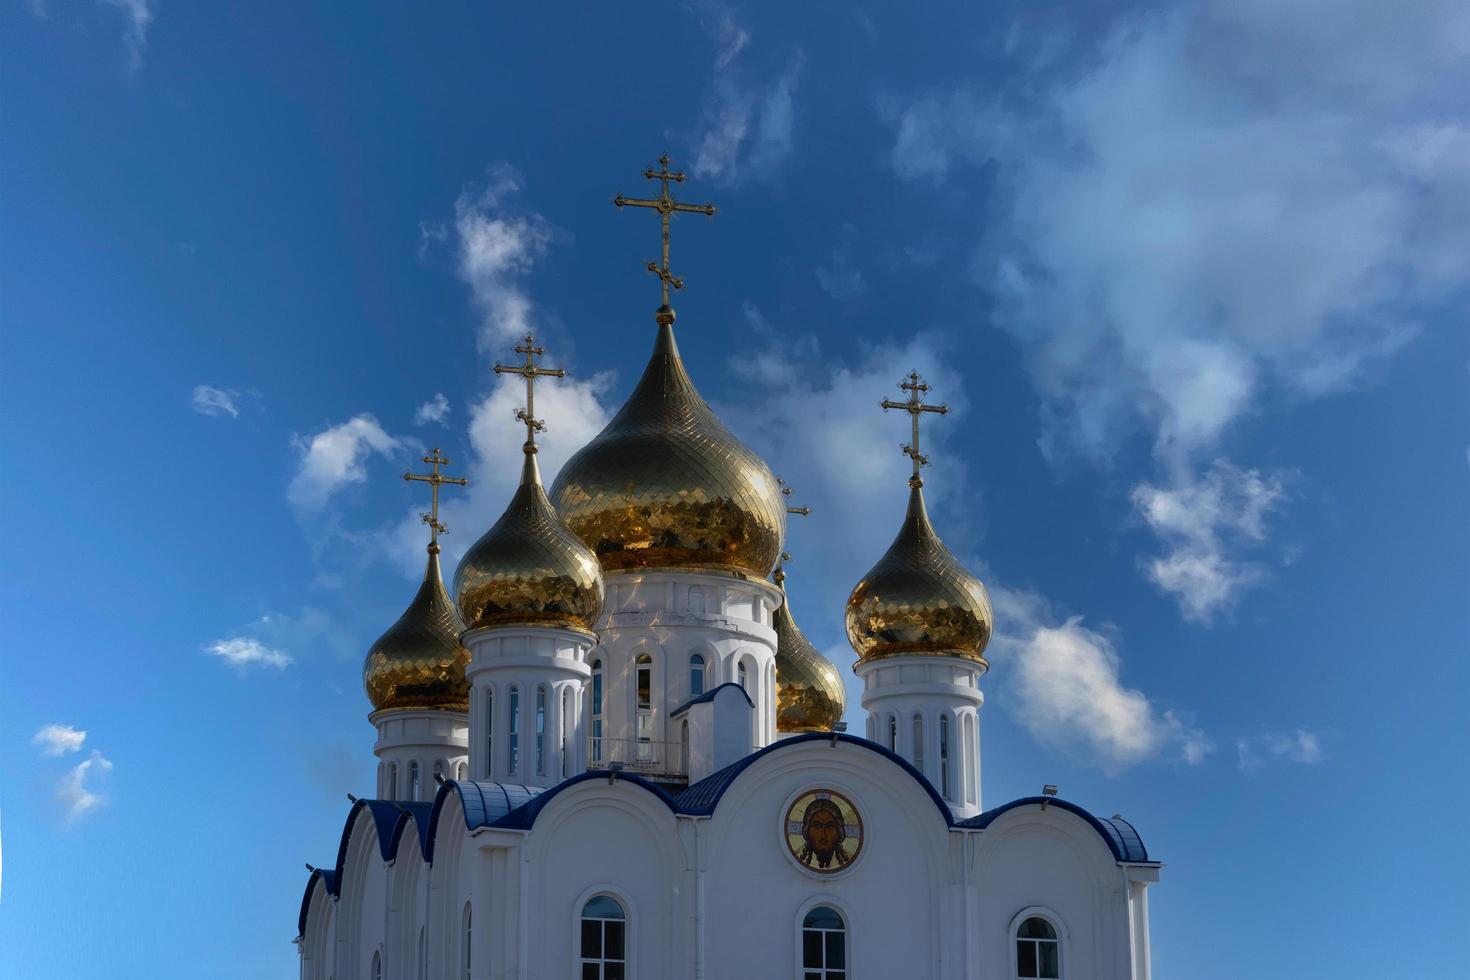 Russisch-Orthodoxe Kathedrale - Petropawlowsk-Kamtschatski foto